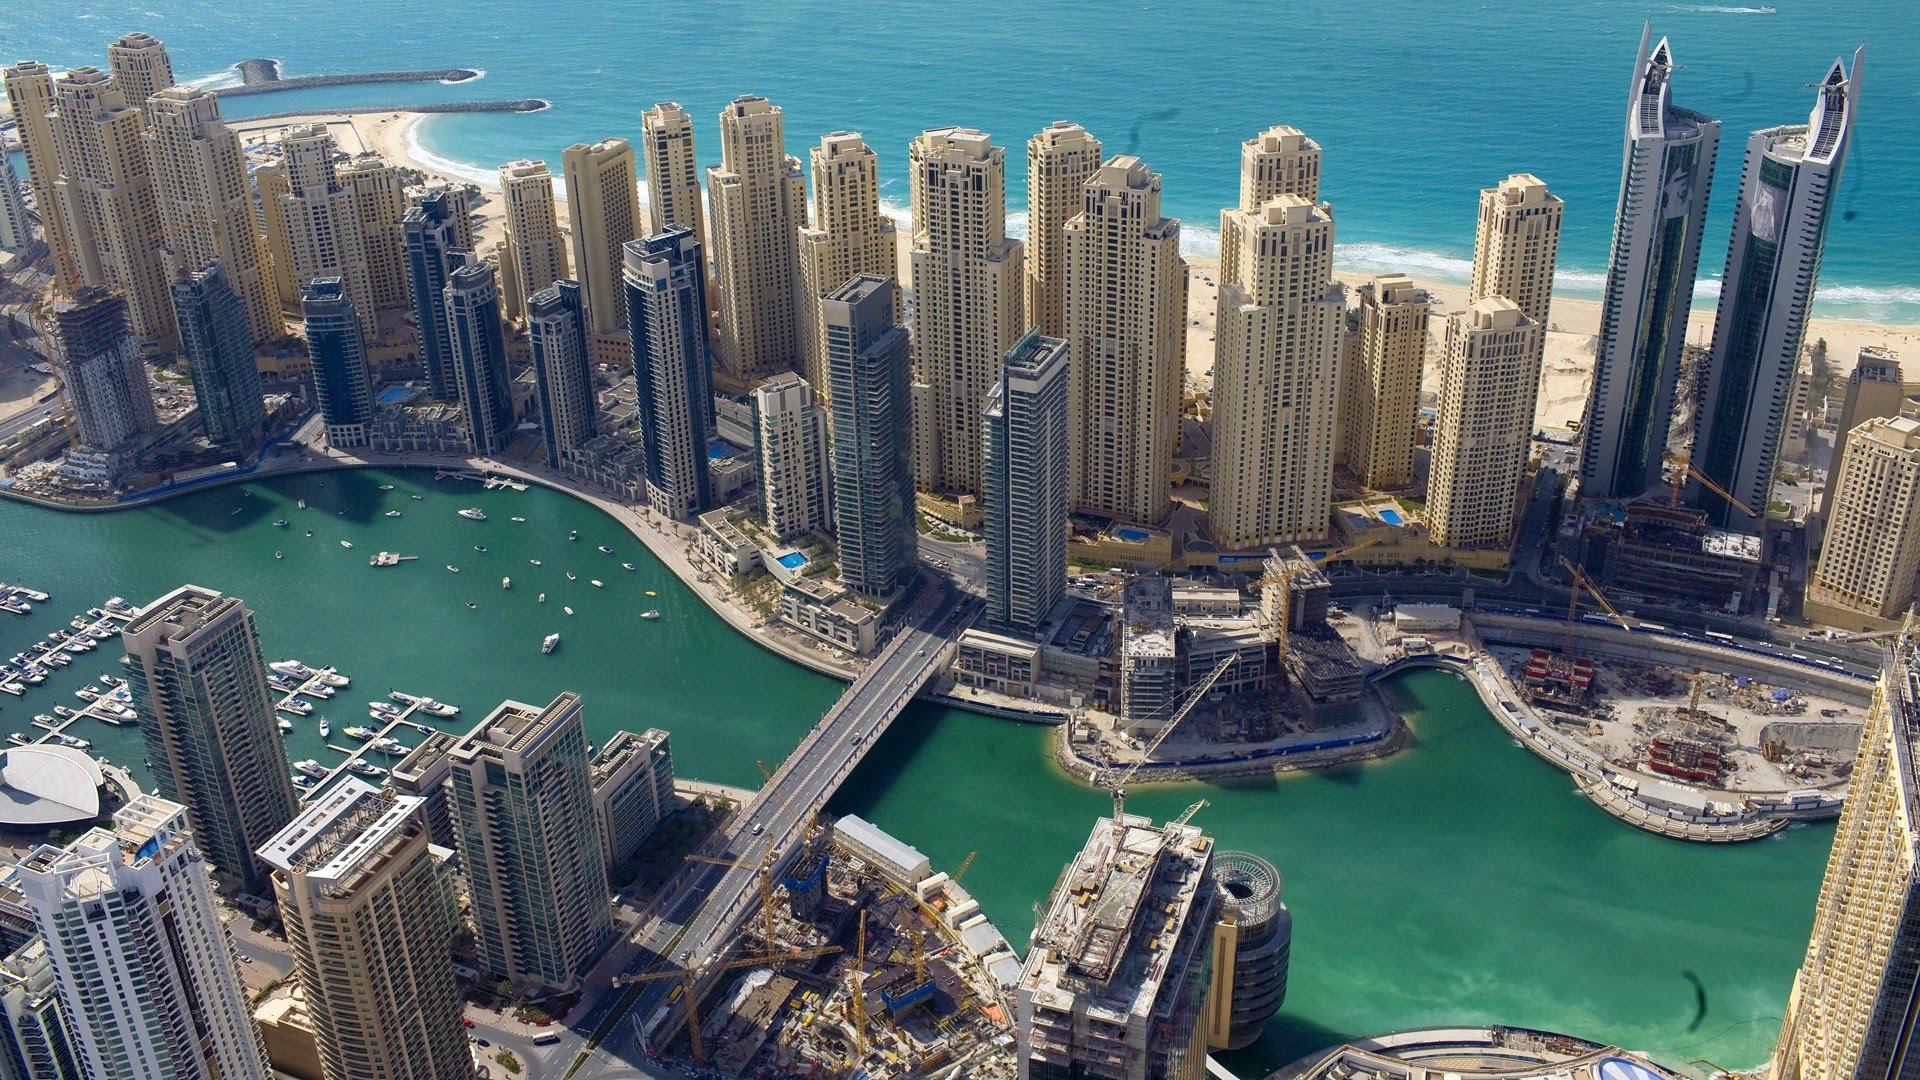 Dubai un video espectacular de la ciudad m s exc ntrica for Espectaculo de dubai fashland